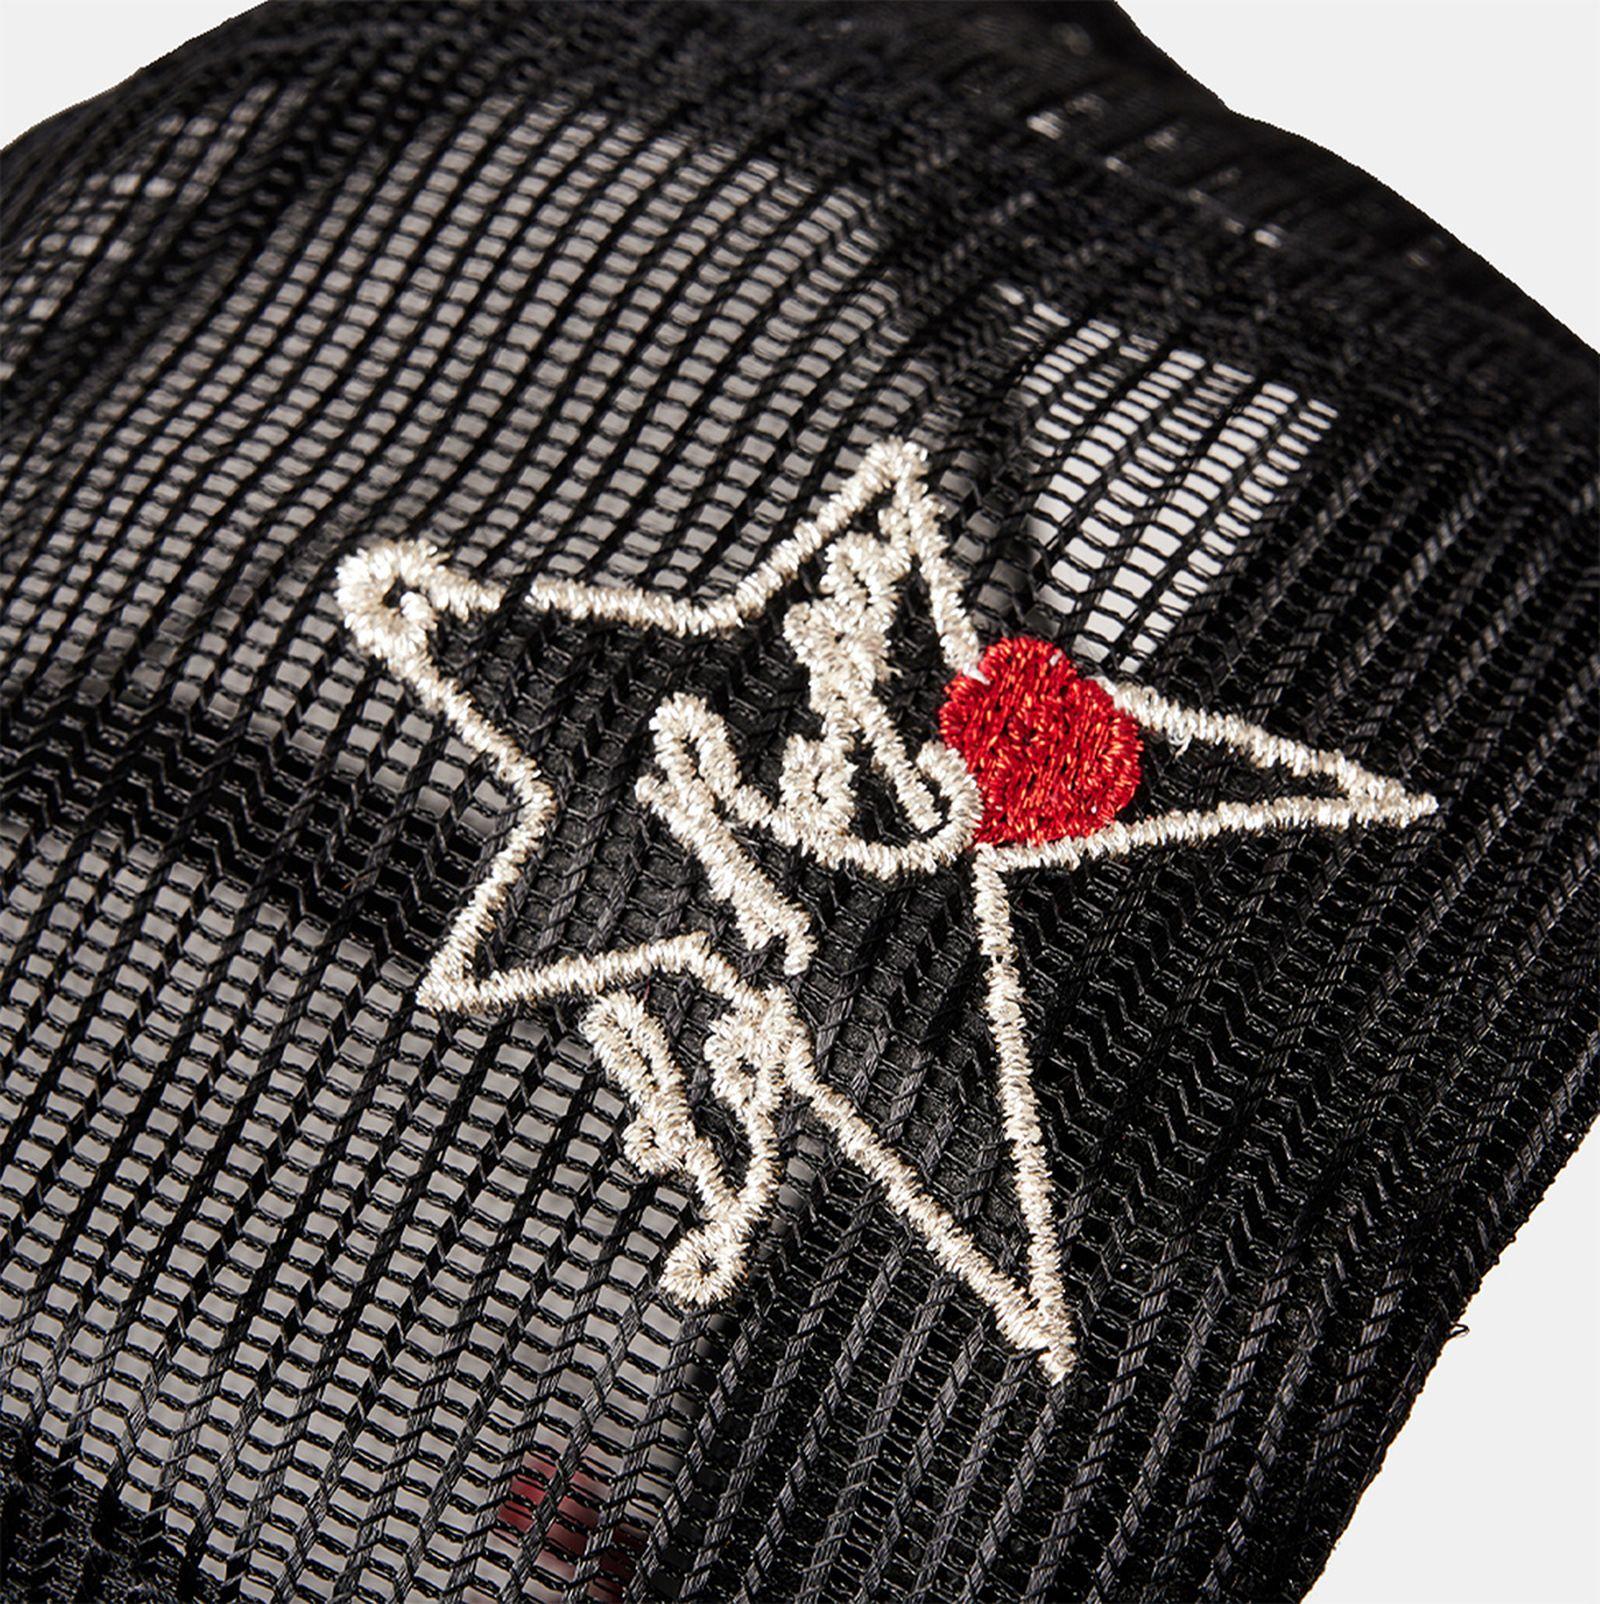 Madhappy New York hat